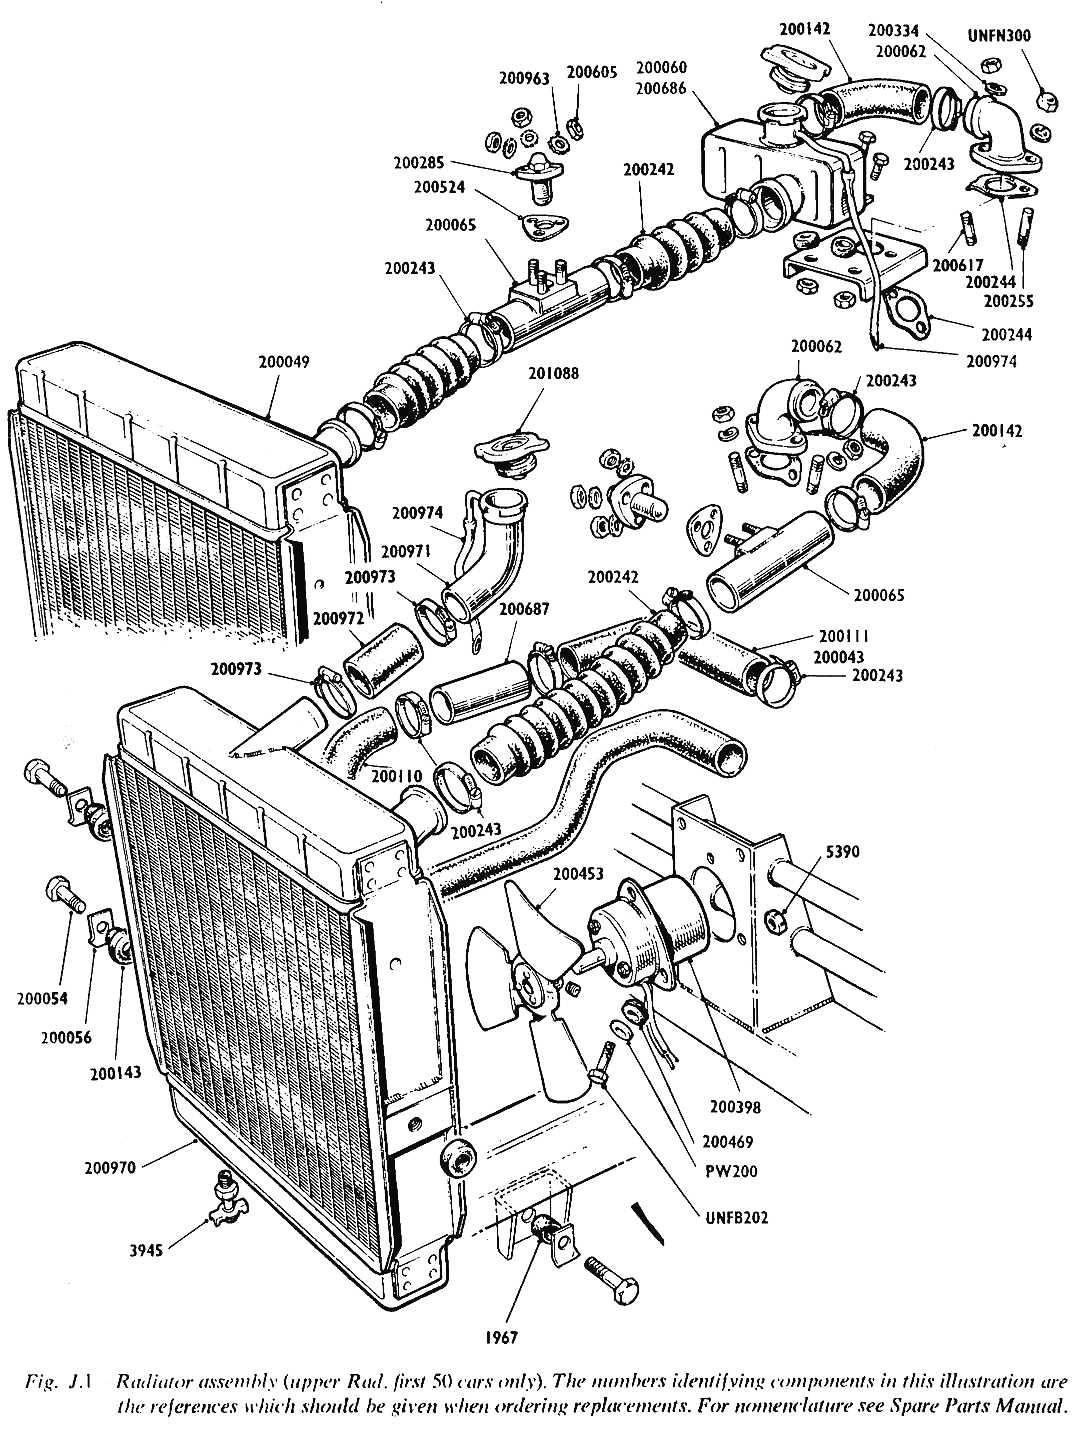 Sabra Handbook Cooling Plate 05